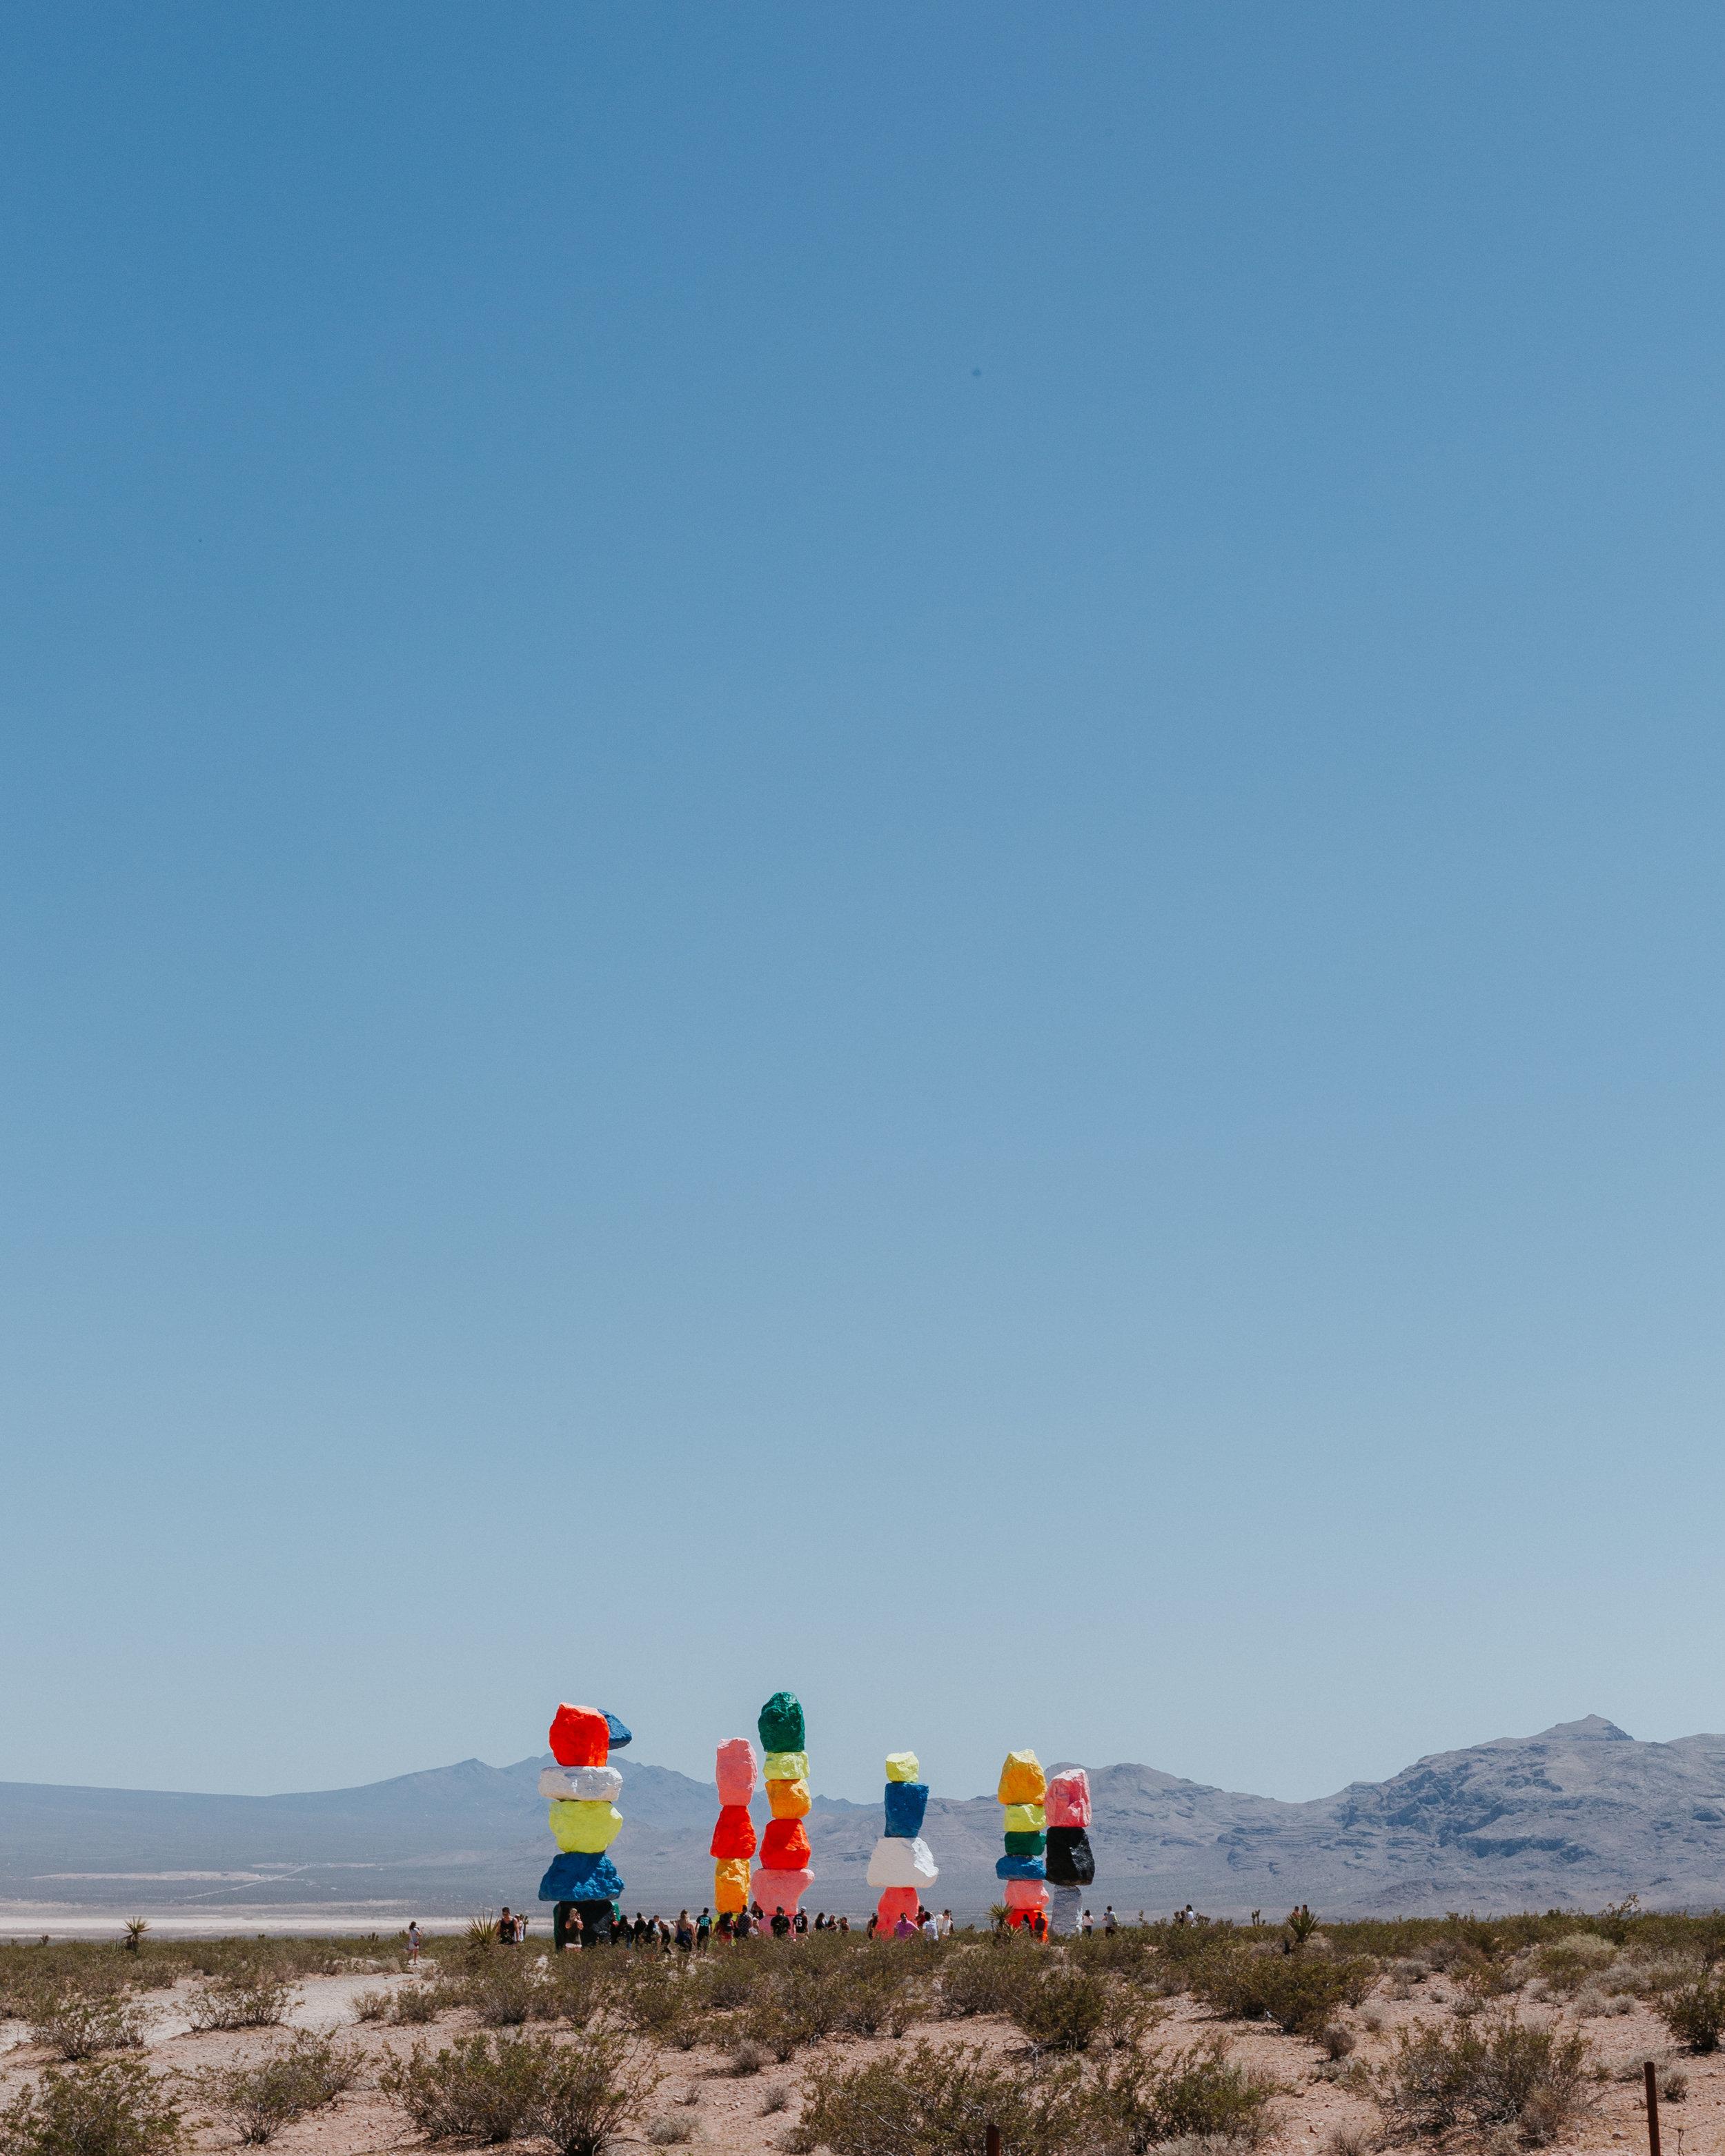 Las Vegas, Sandy Valley, Nevada desert 7 magic mountains